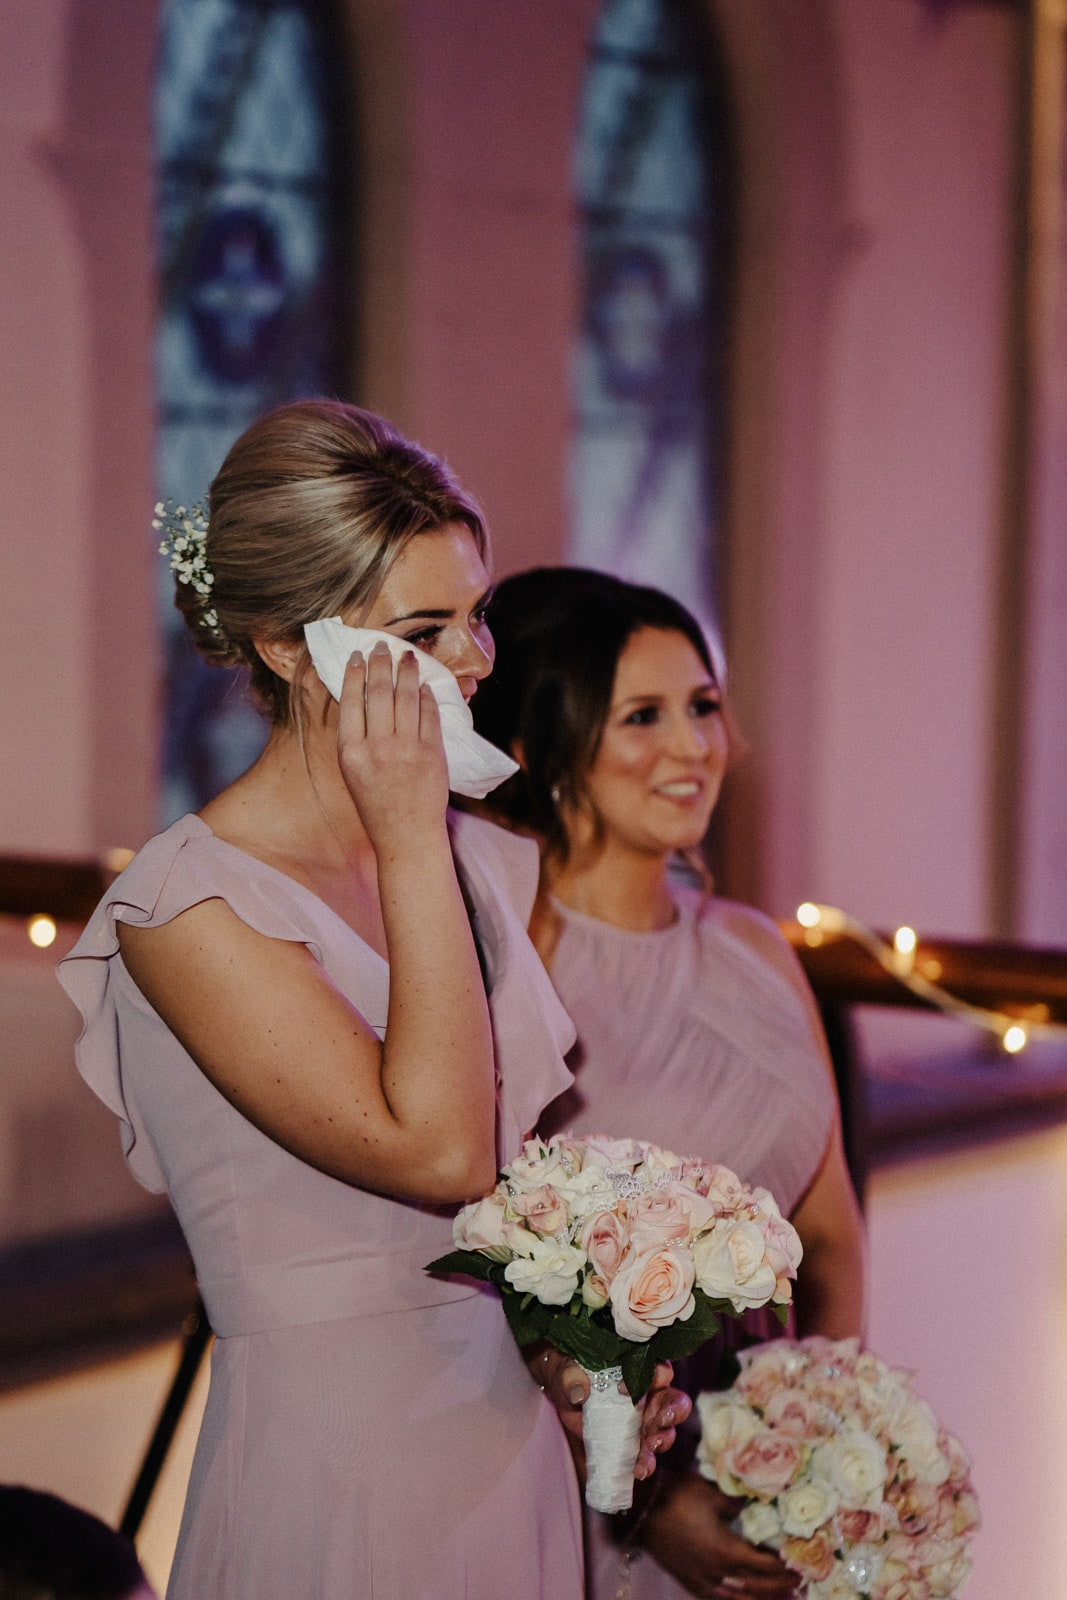 Oran-Mor-Wedding-Photographer-DearlyPhotography (17 of 55).jpg